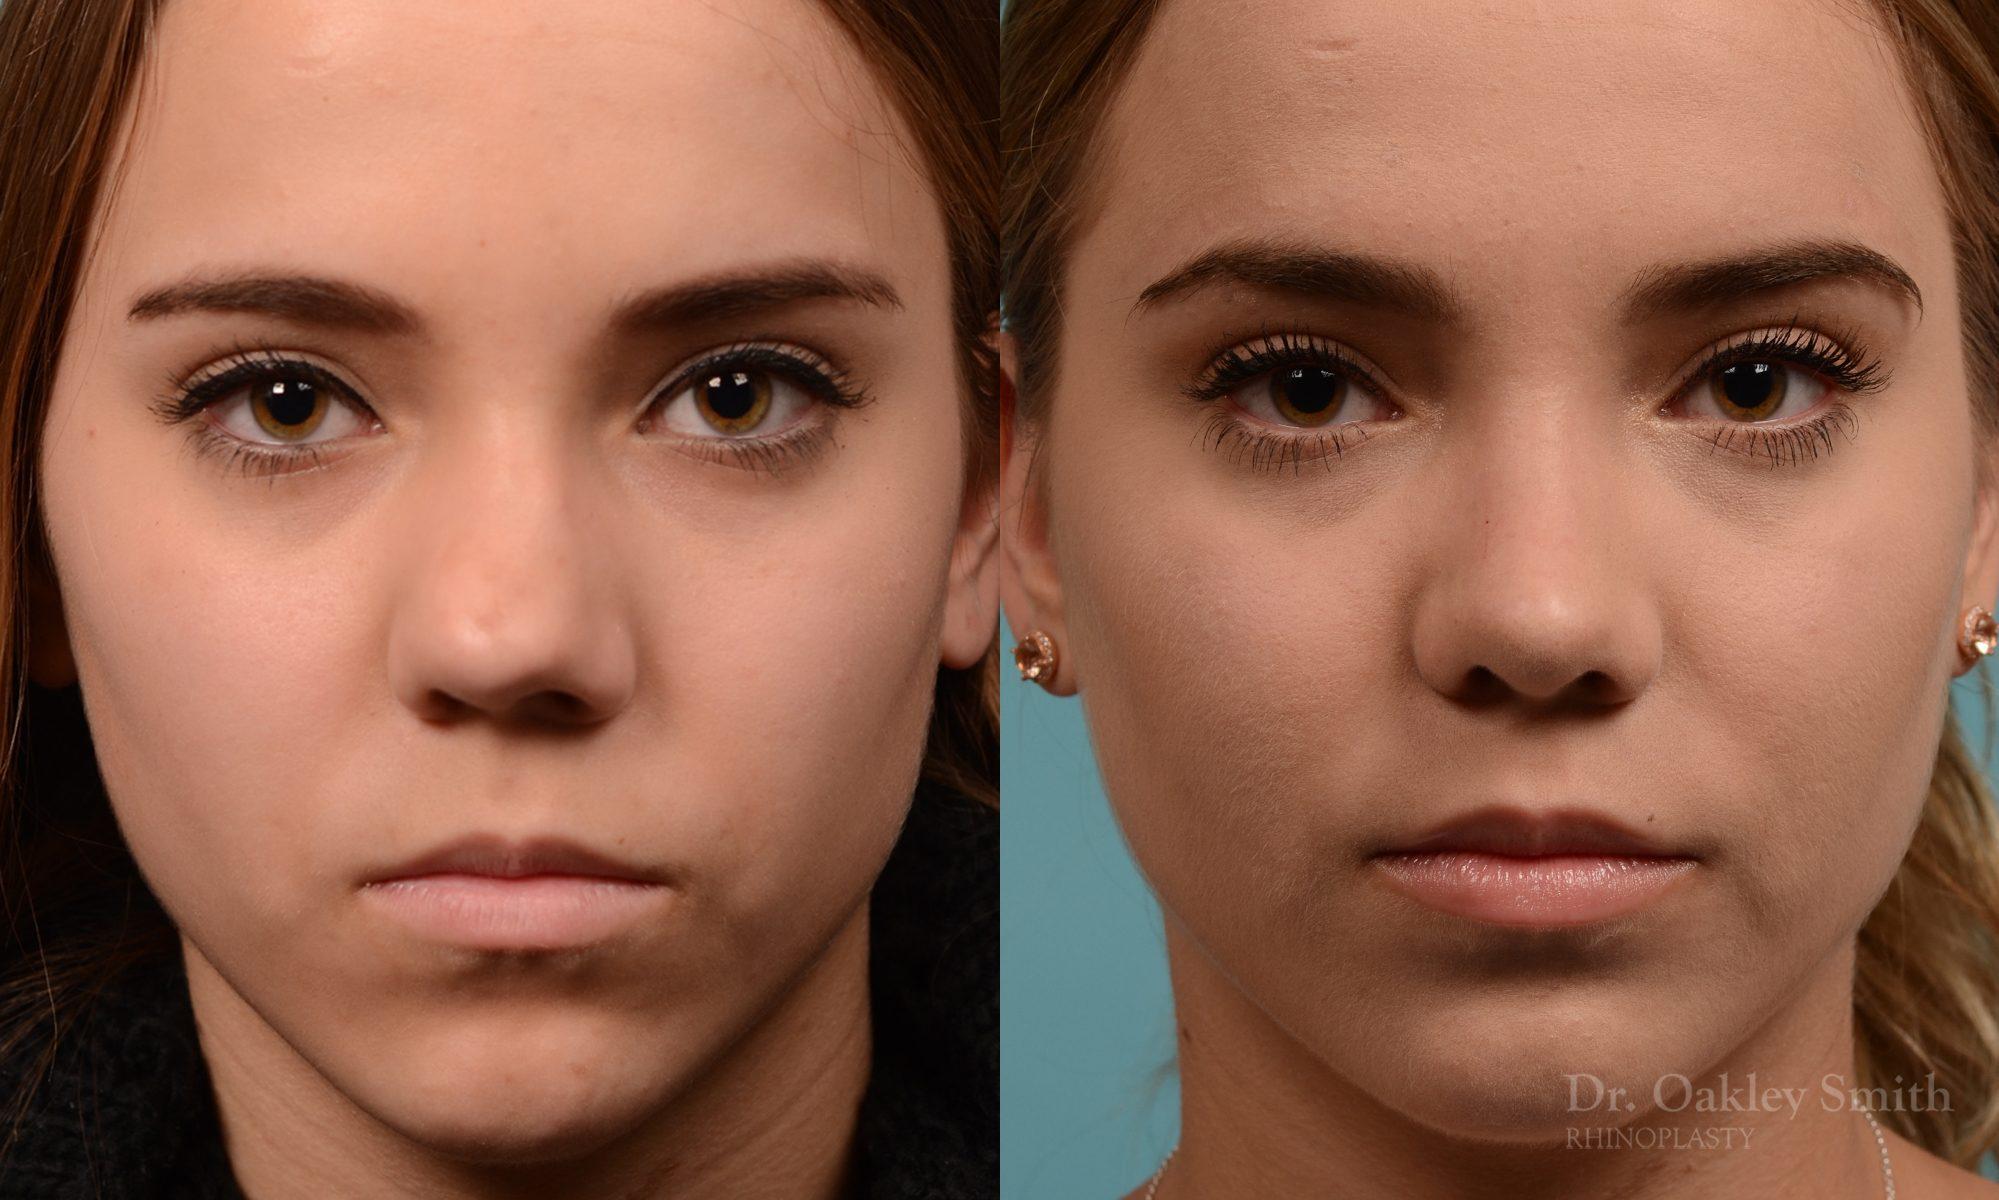 Female nose rhinoplasty remove curvature